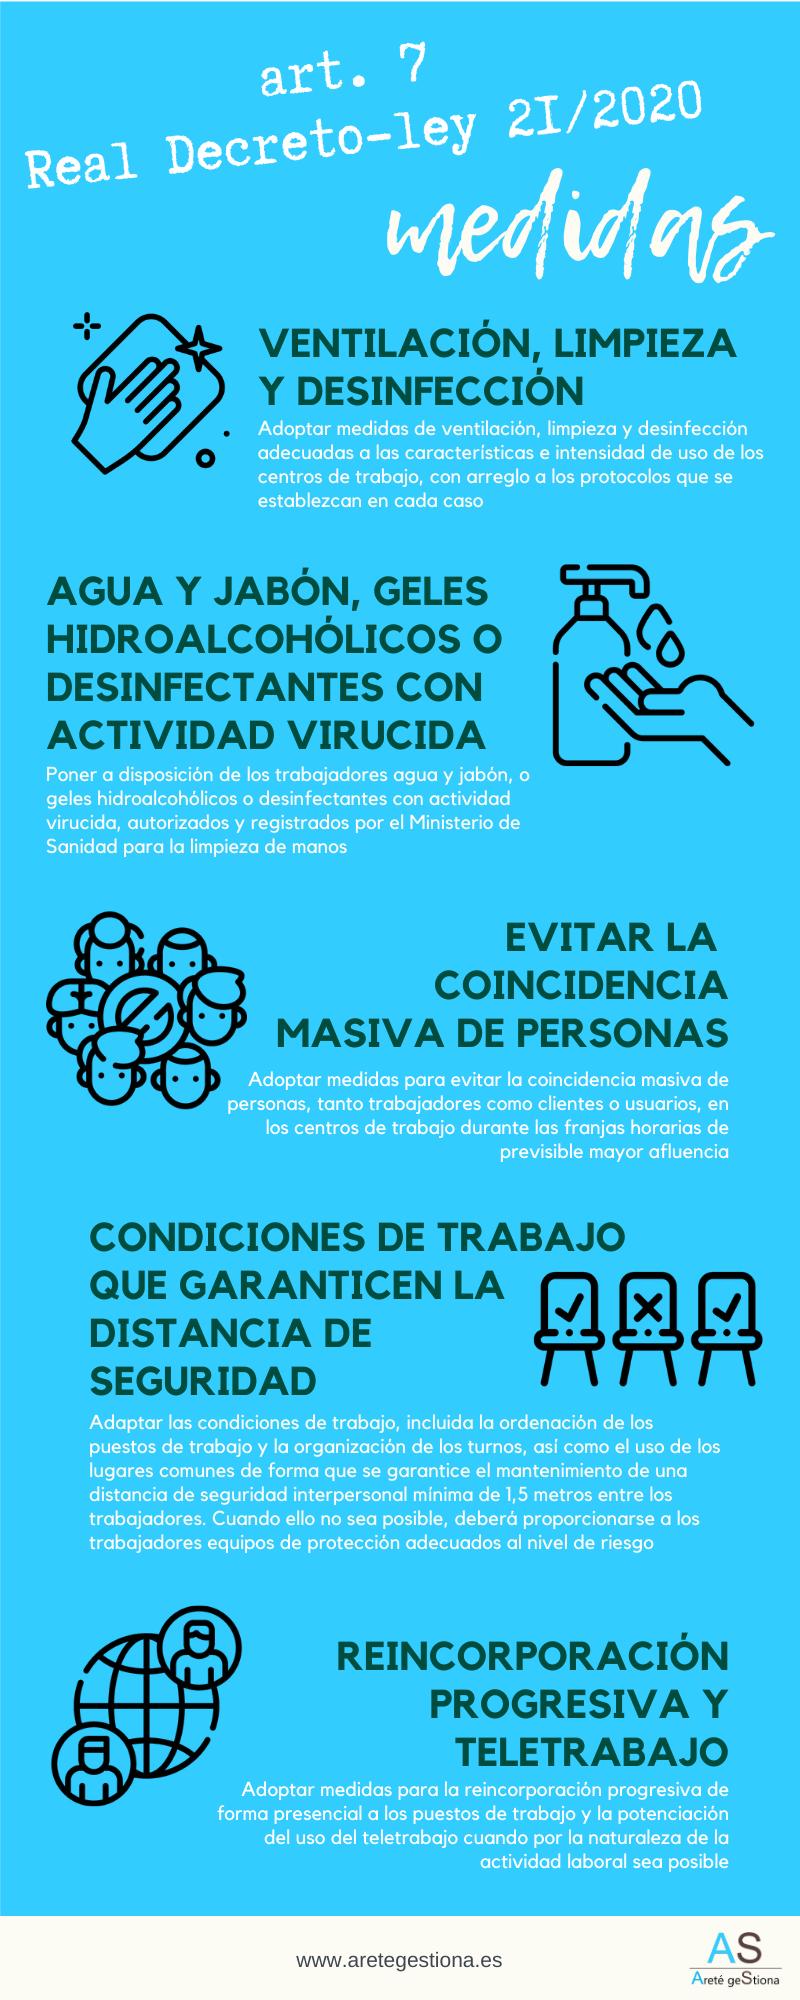 Infografia_Real_Decreto_Ley_21_2020